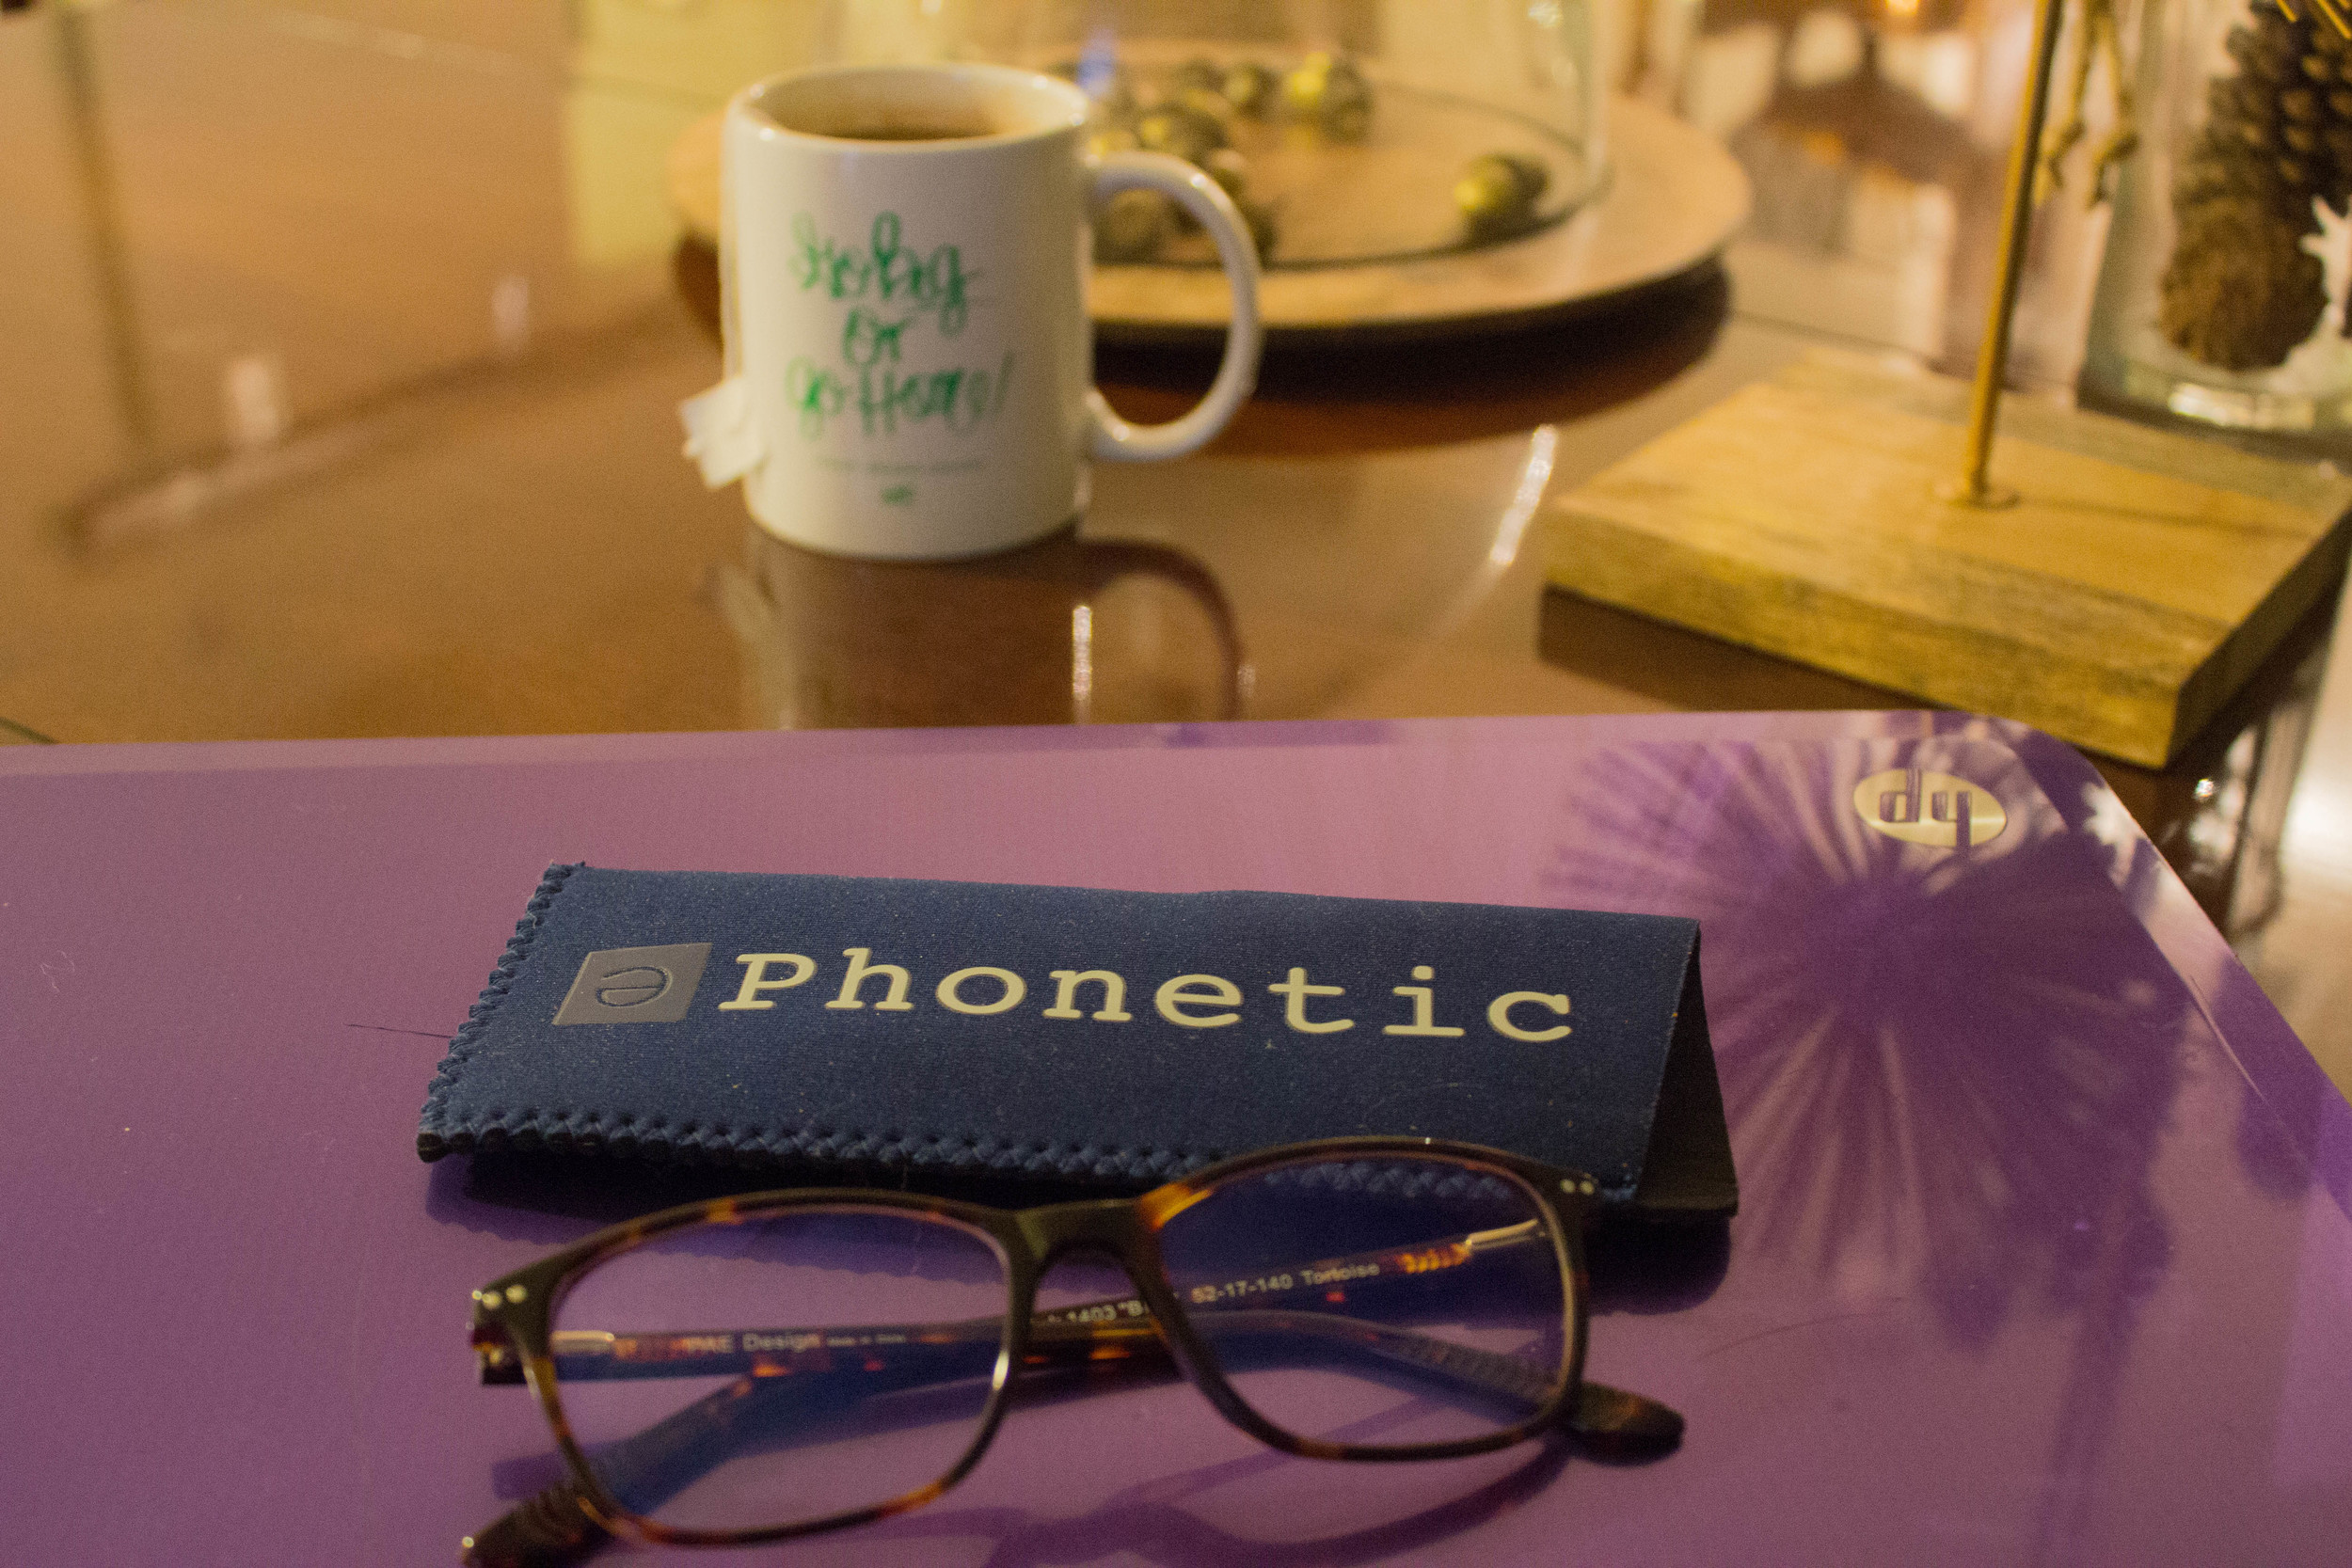 phonetics eyewear, j crew tuxedo top, kendra scott earrings, ashley brooke designs mug